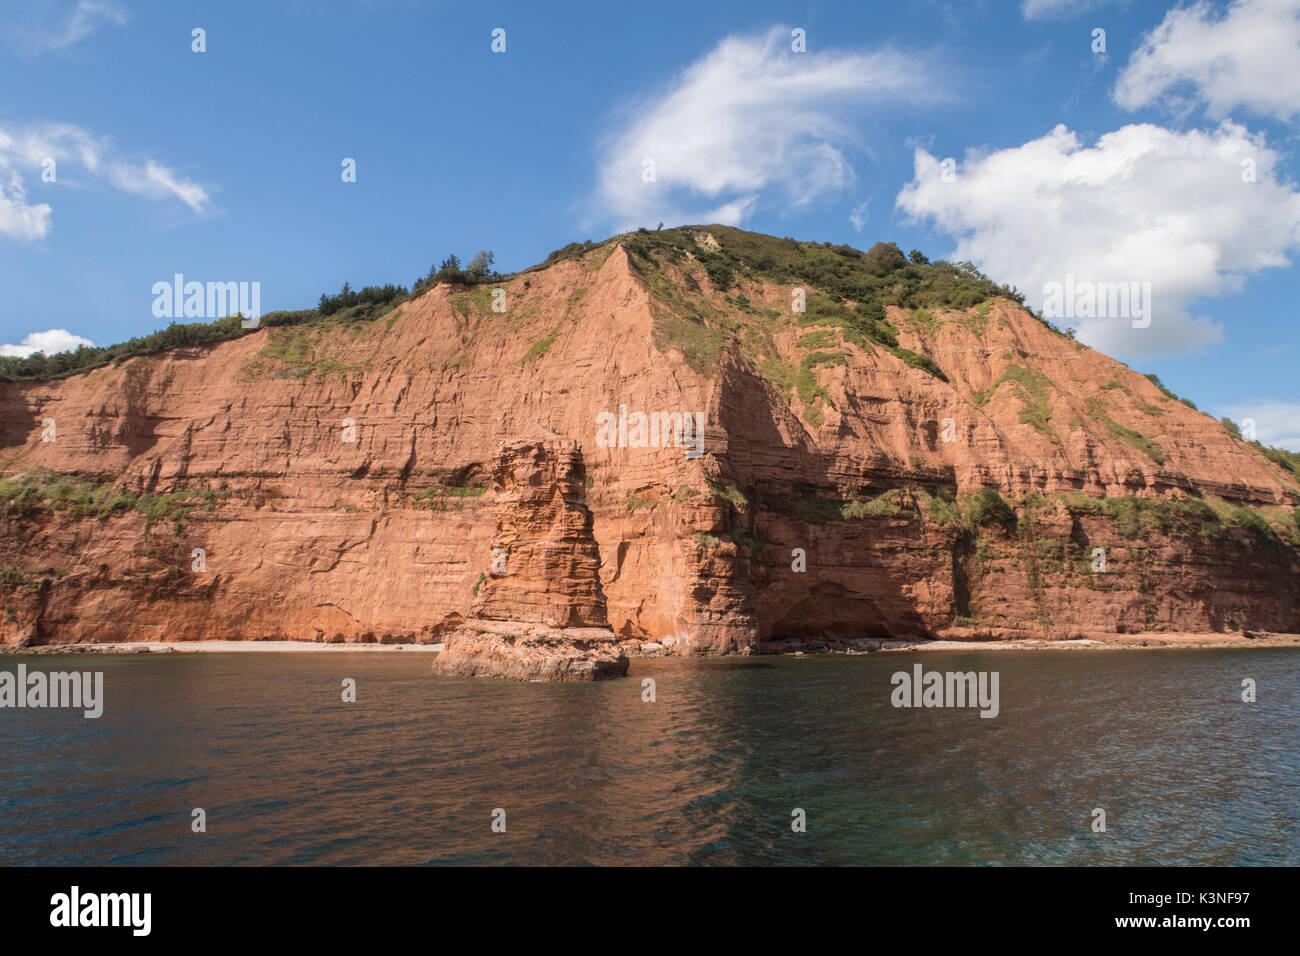 High Peak rises above a triassic rock stack near Ladram Bay, Sidmouth, Devon. - Stock Image